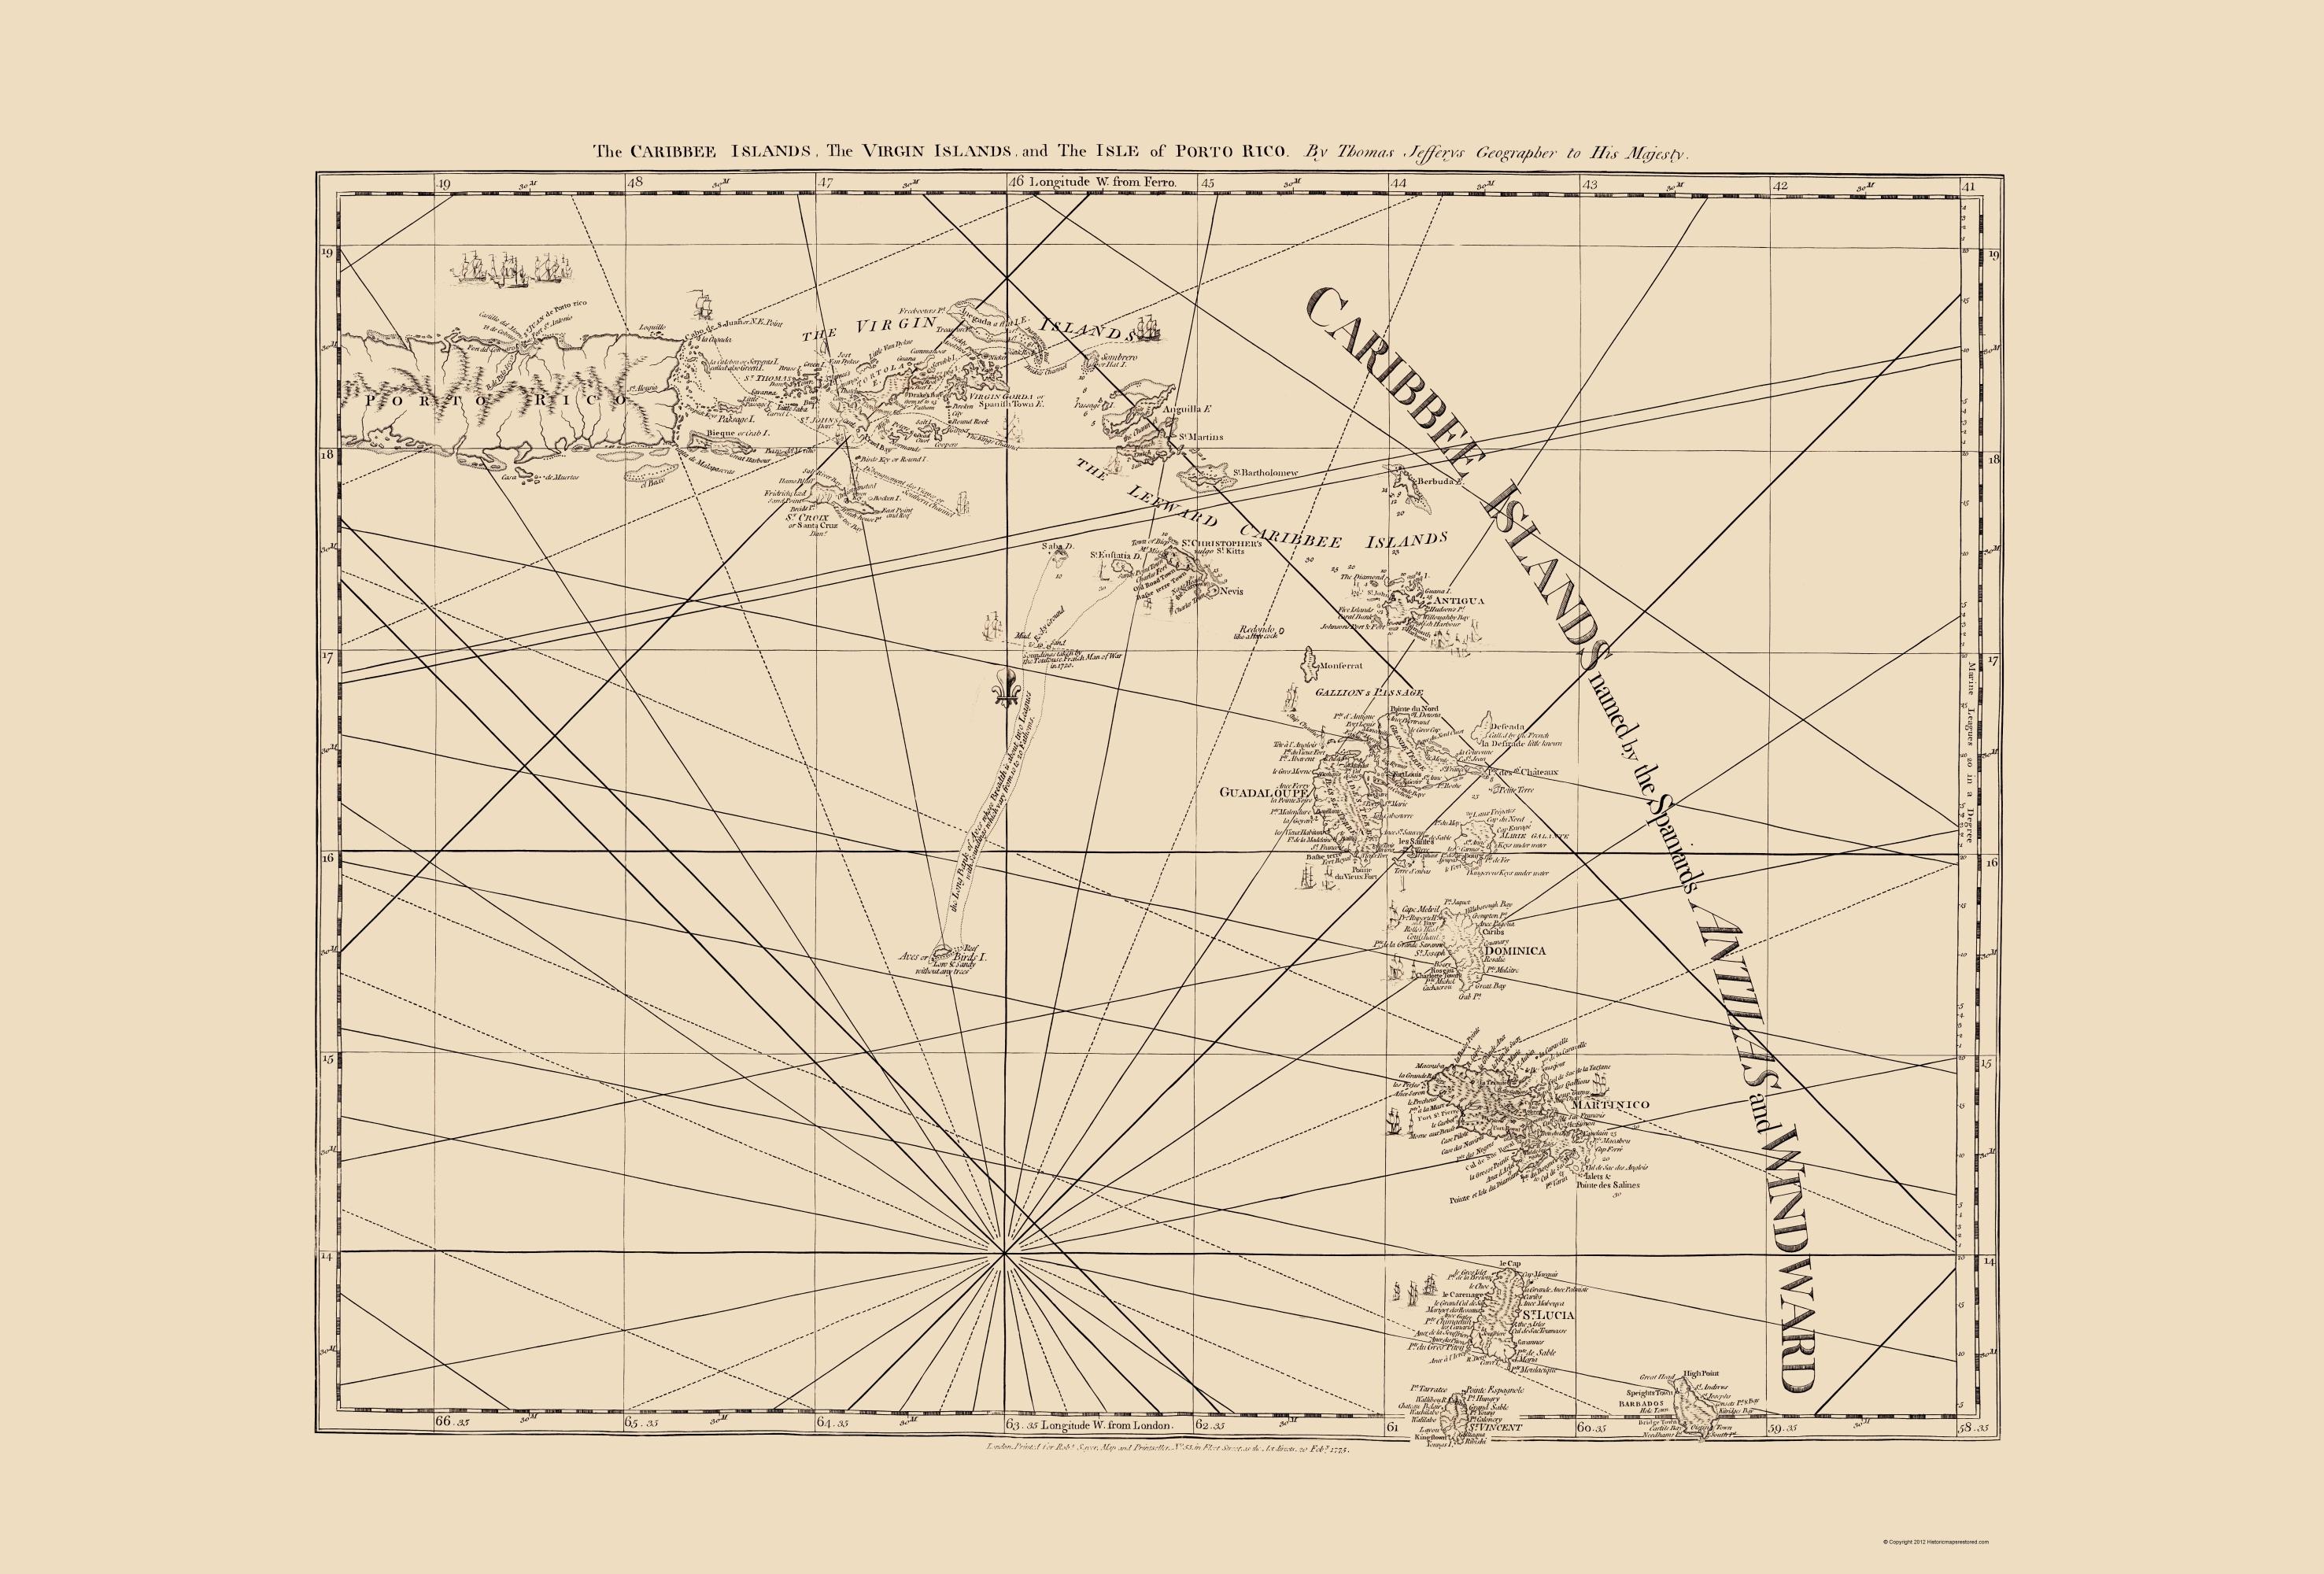 Old Caribbean Map - Virgin Islands, Puerto Rico 1775